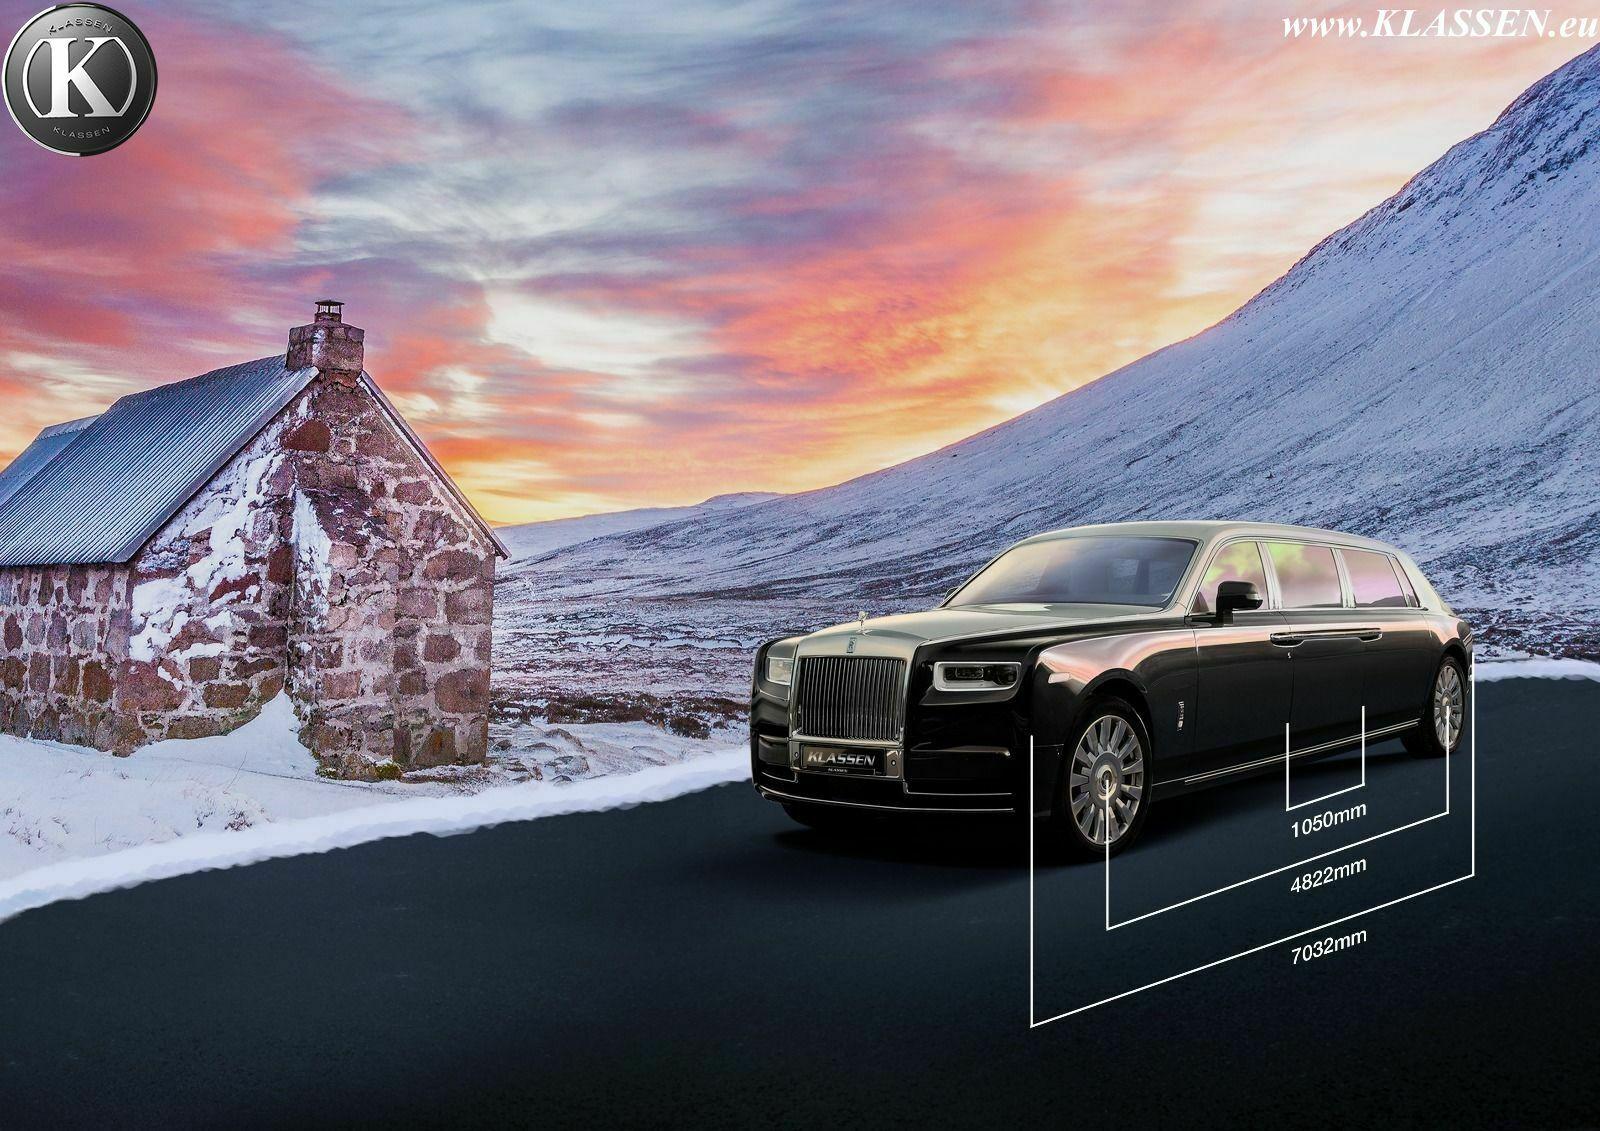 Rolls-Royce-Phantom-by-Klassen-4